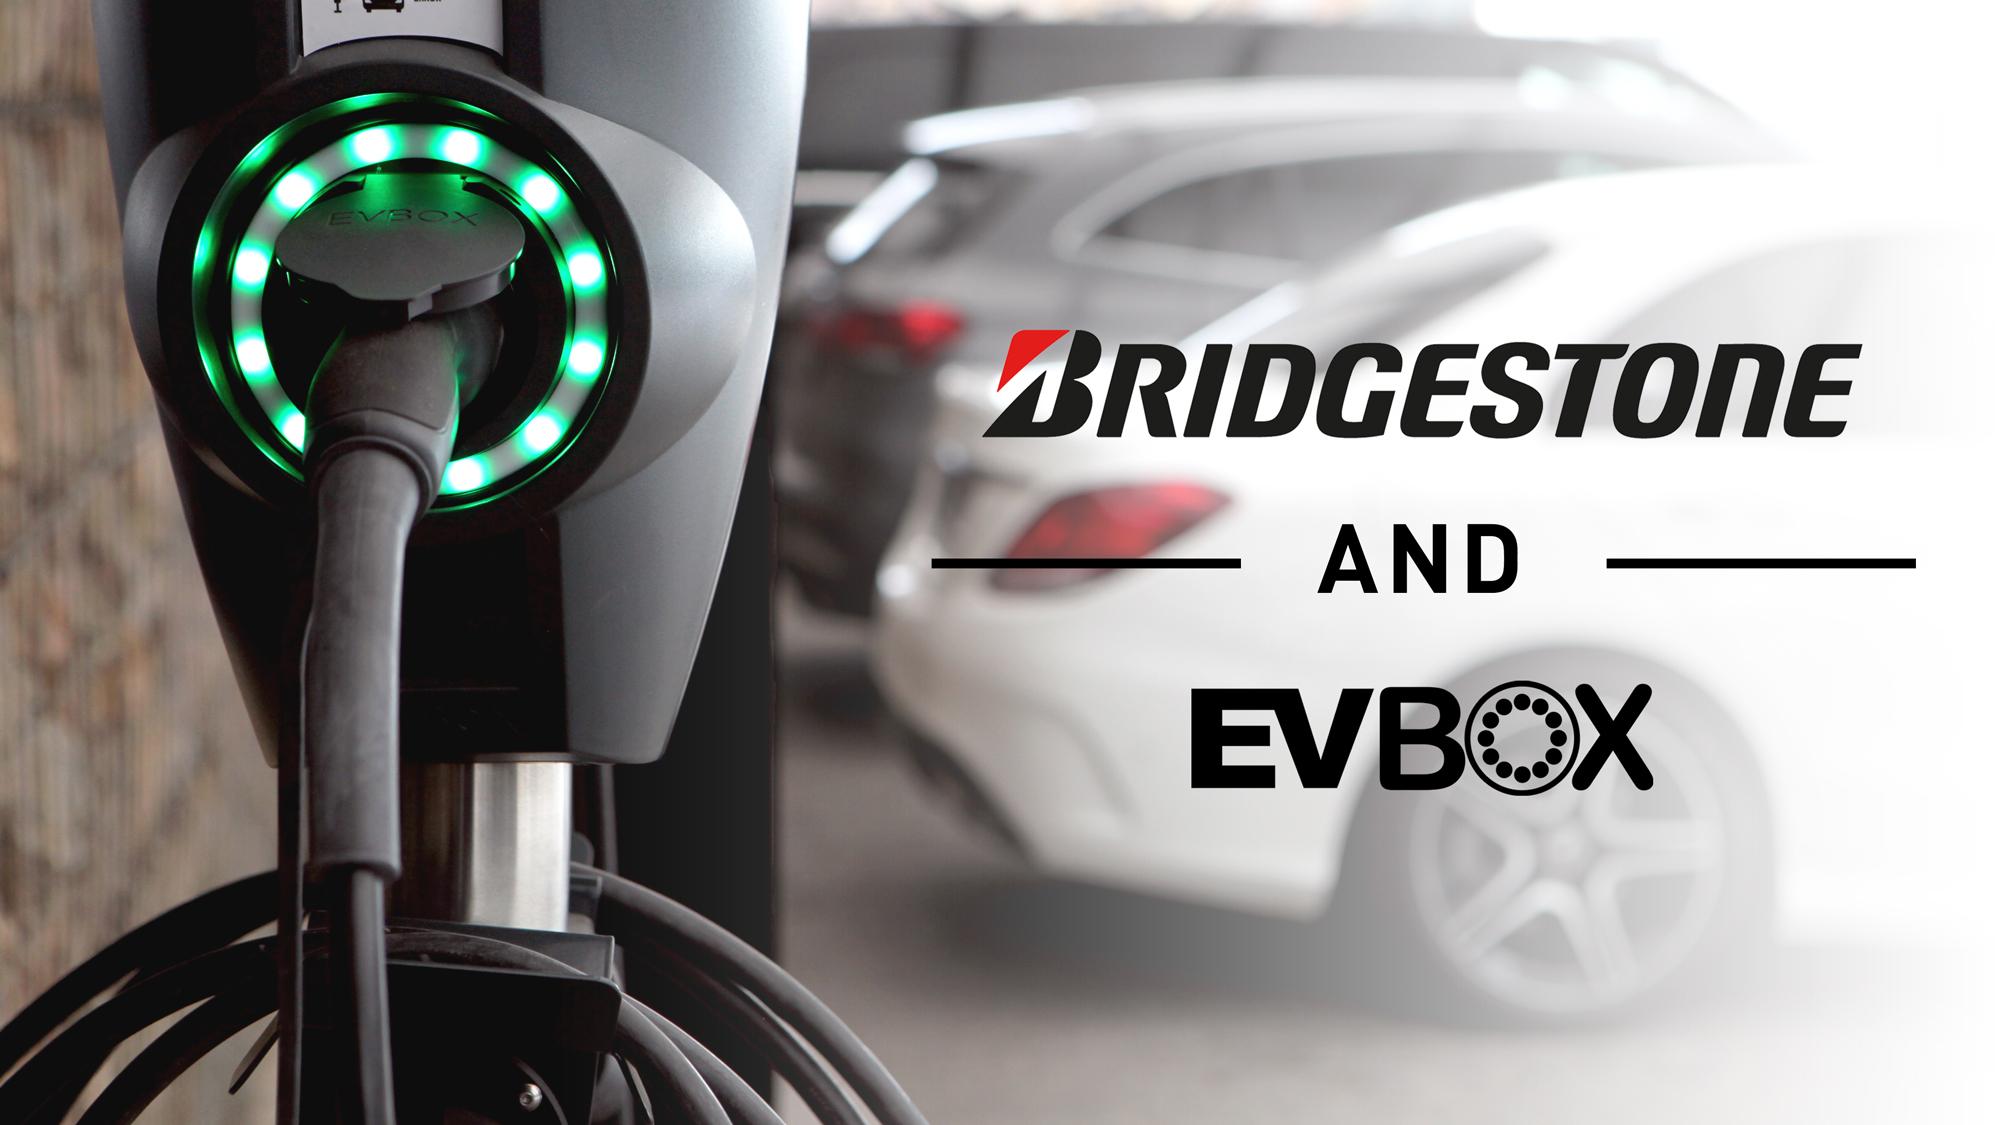 Bridgestone EMIA kooperiert mit EVBox Group